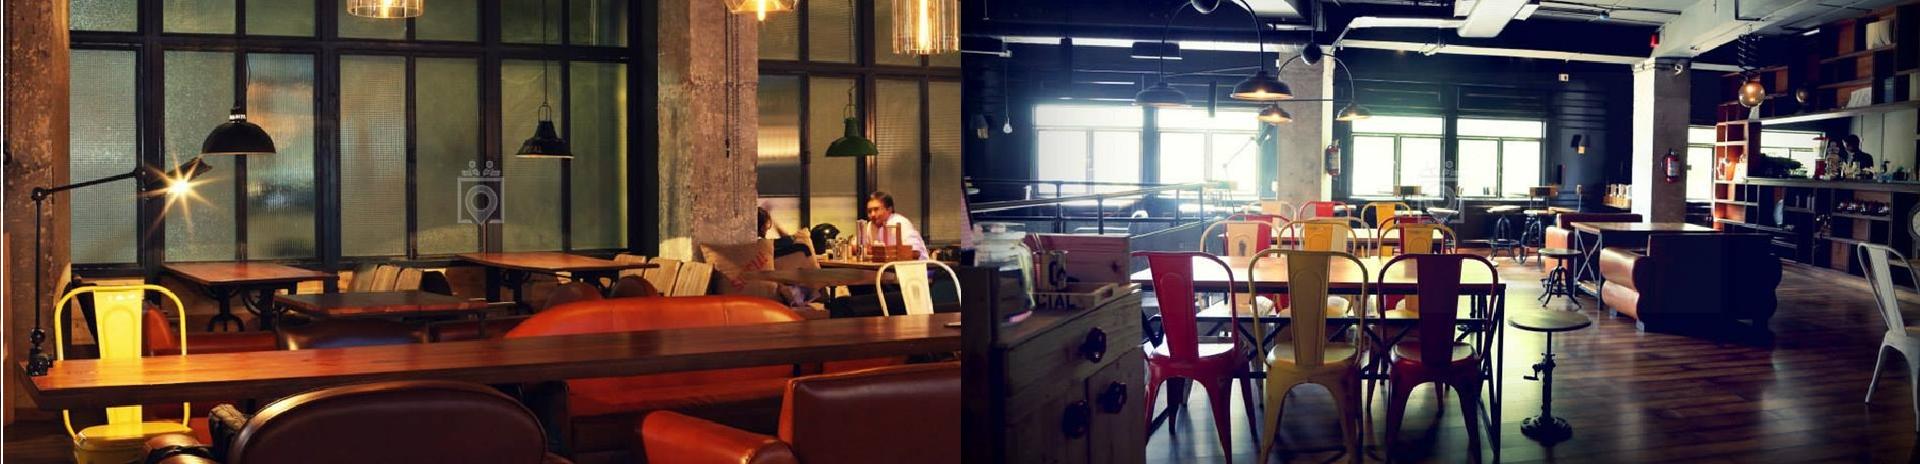 Dating cafe neuss